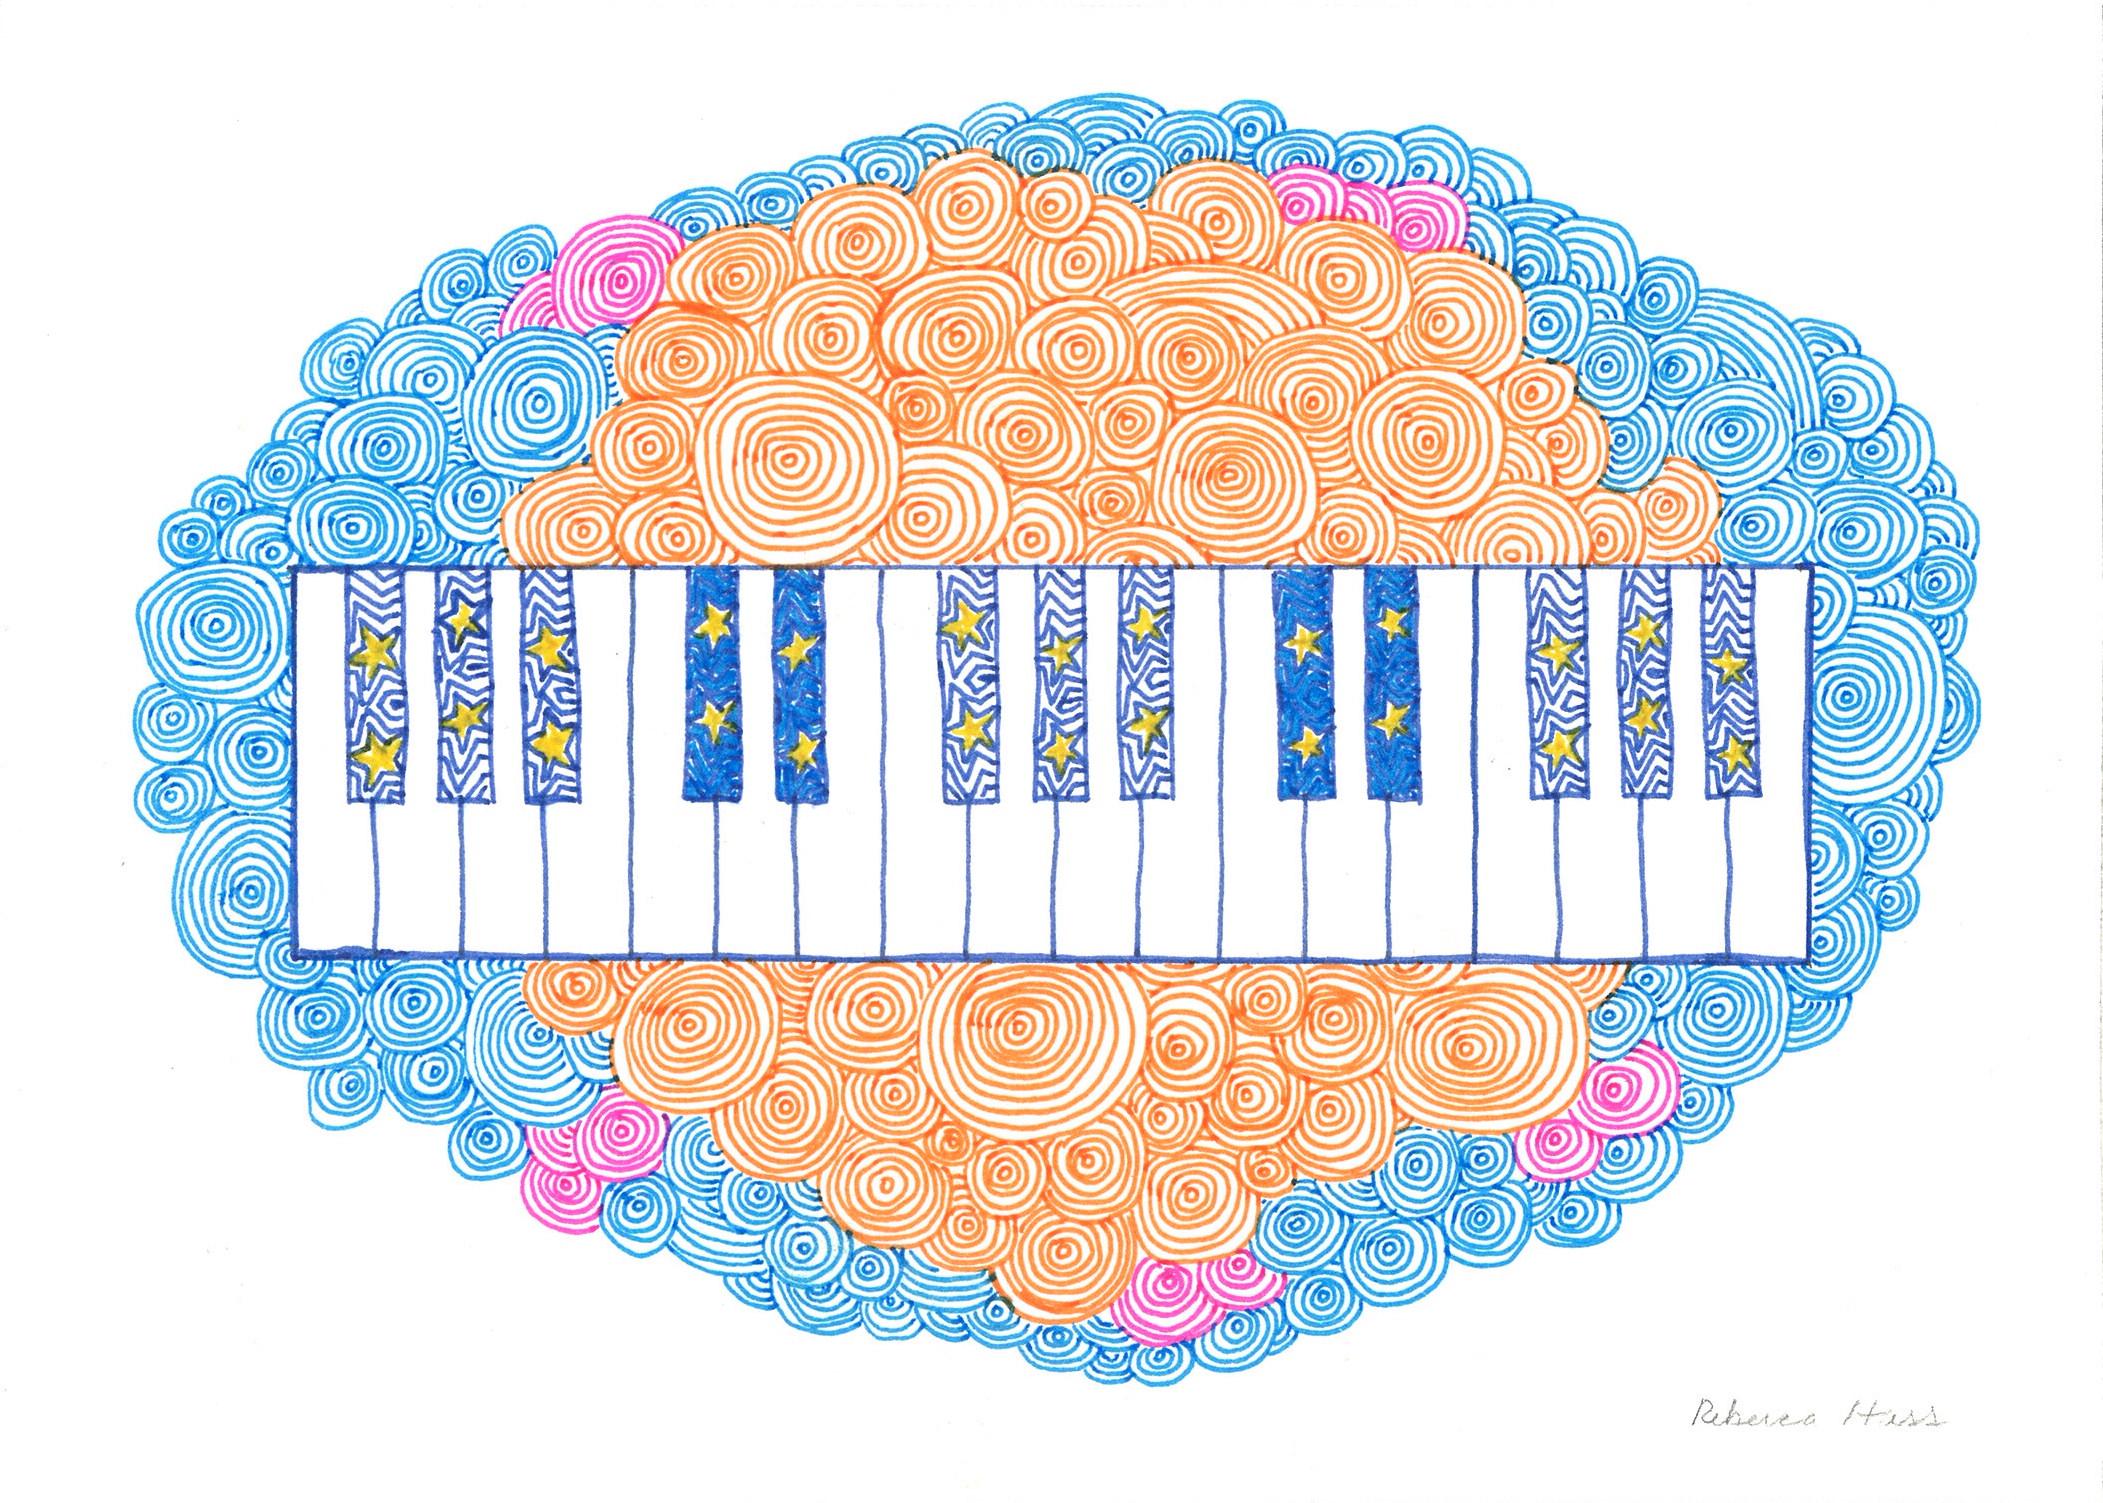 Rebecca-Hass-Piano-Print.jpg